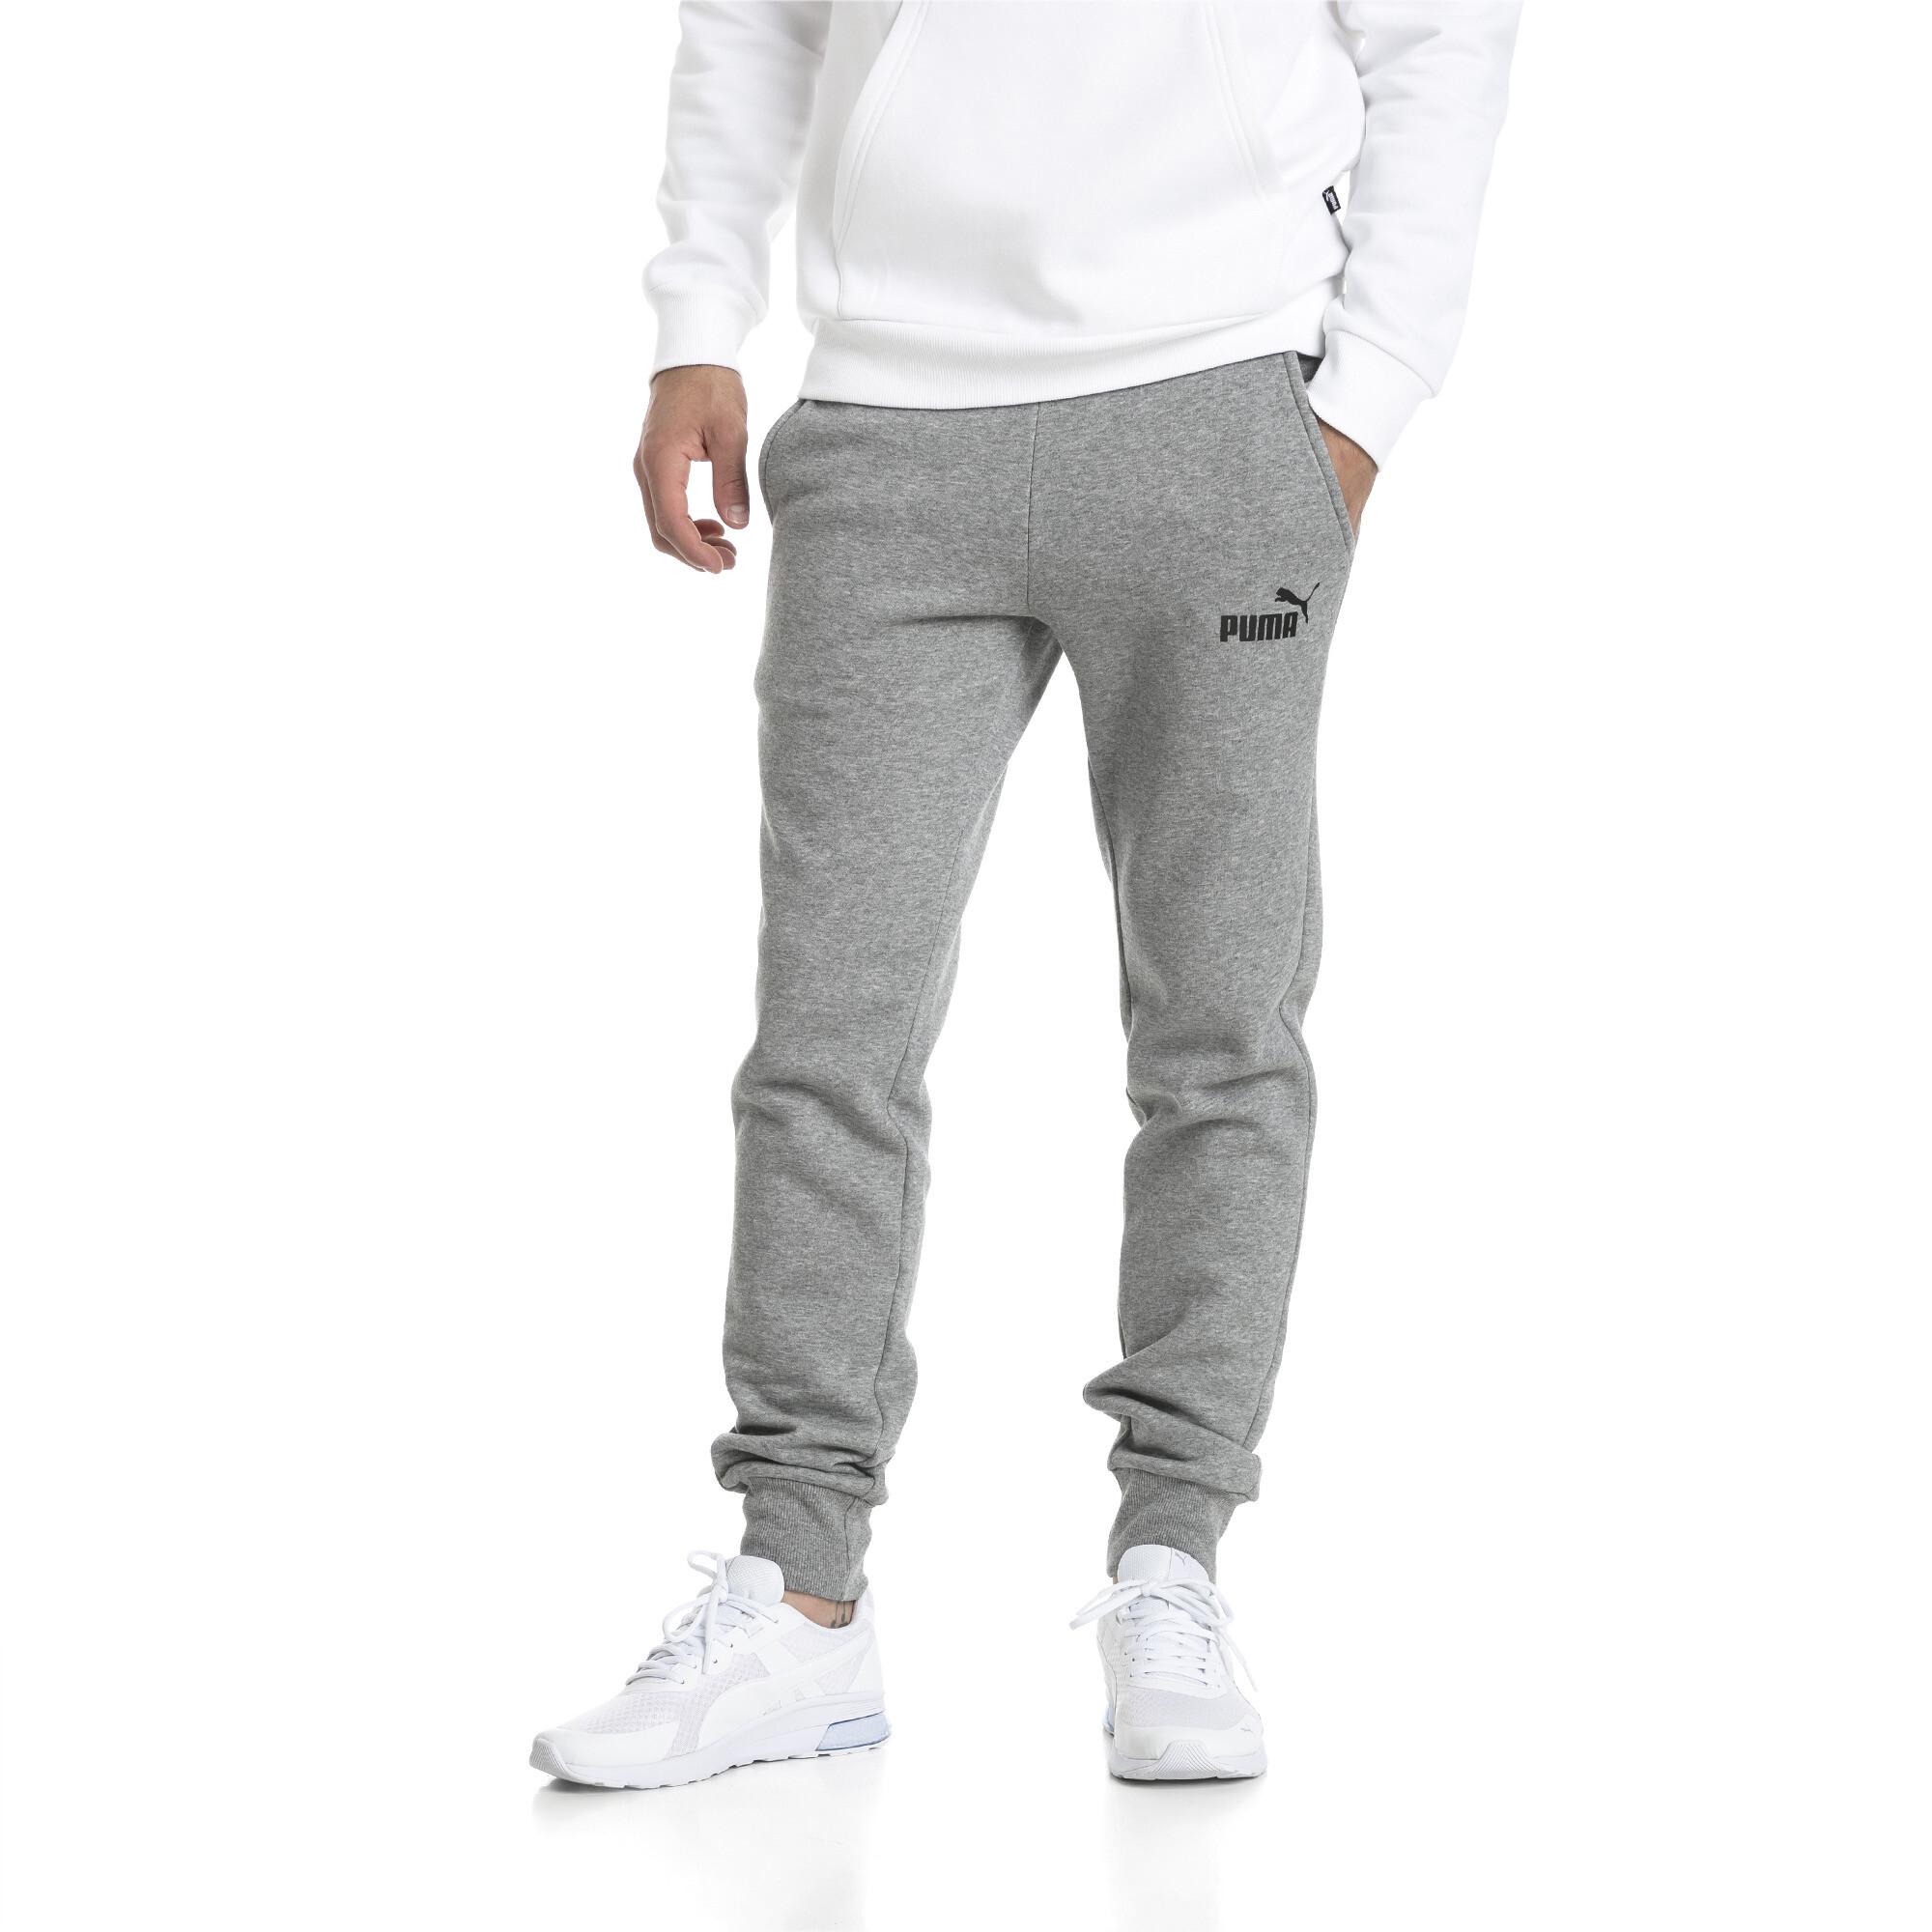 Image Puma Essentials Knitted Fleece Men's Sweatpants #1